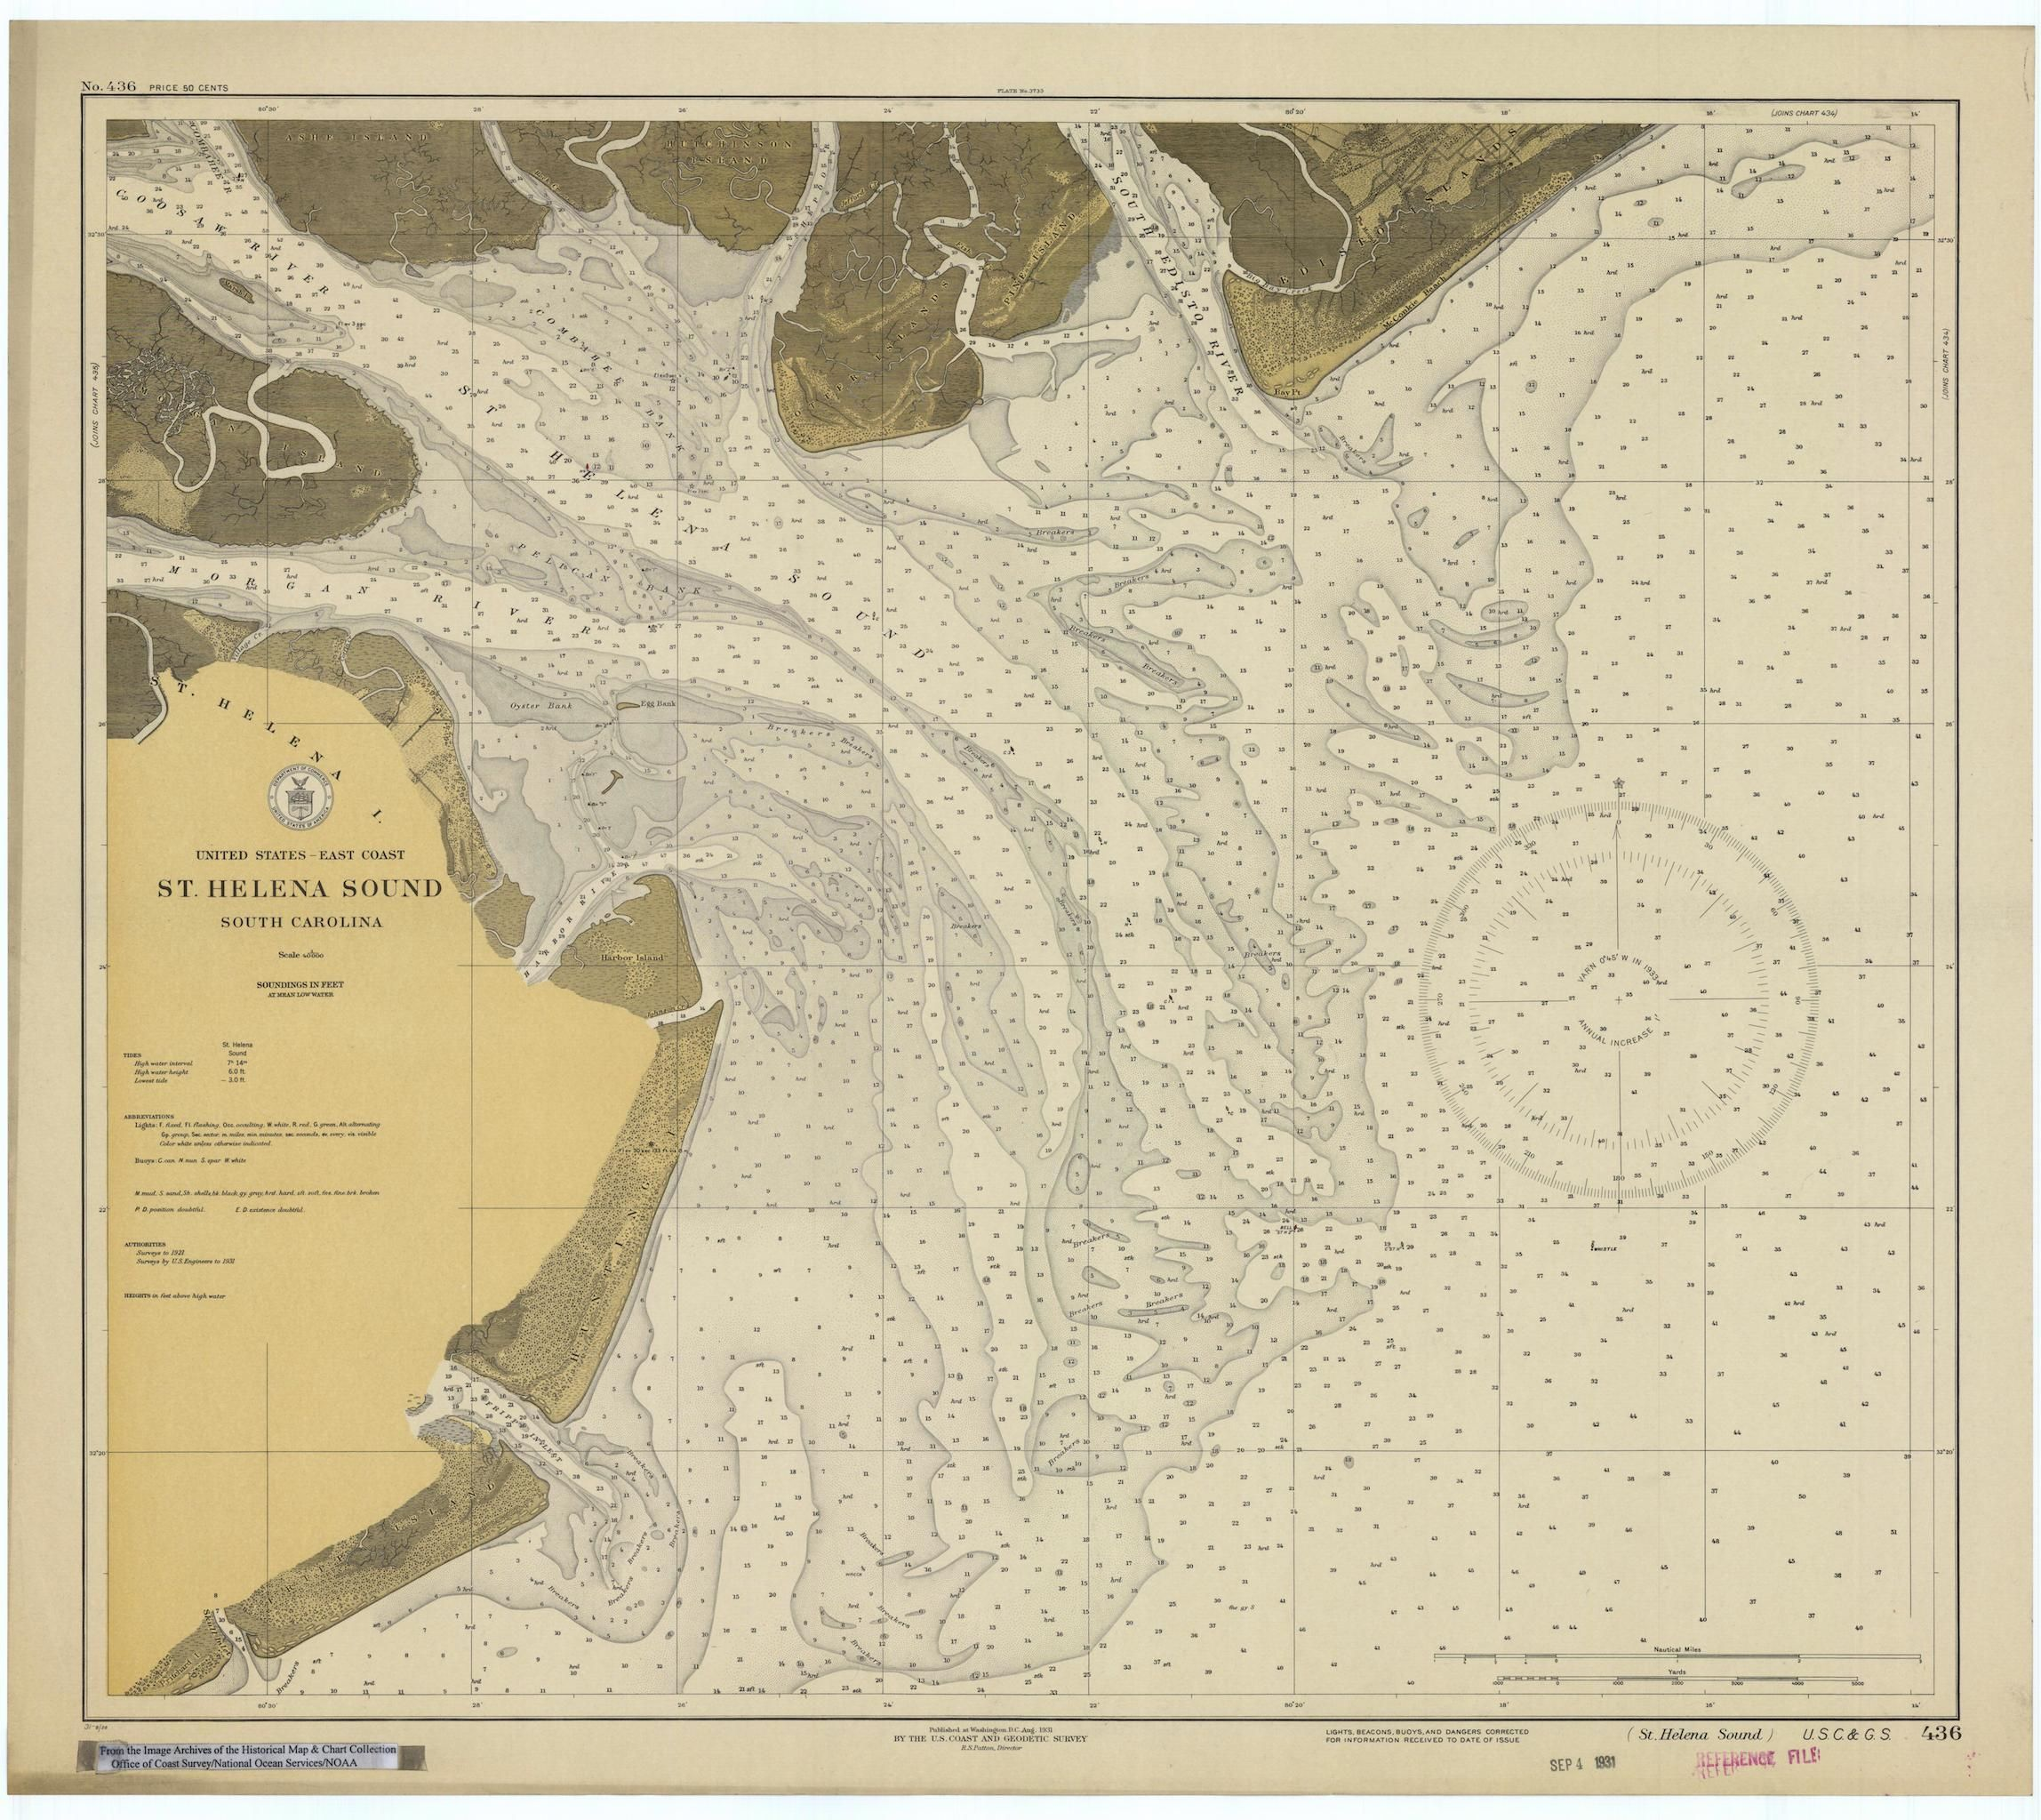 St helena sound map 1931 historical maps map sound map